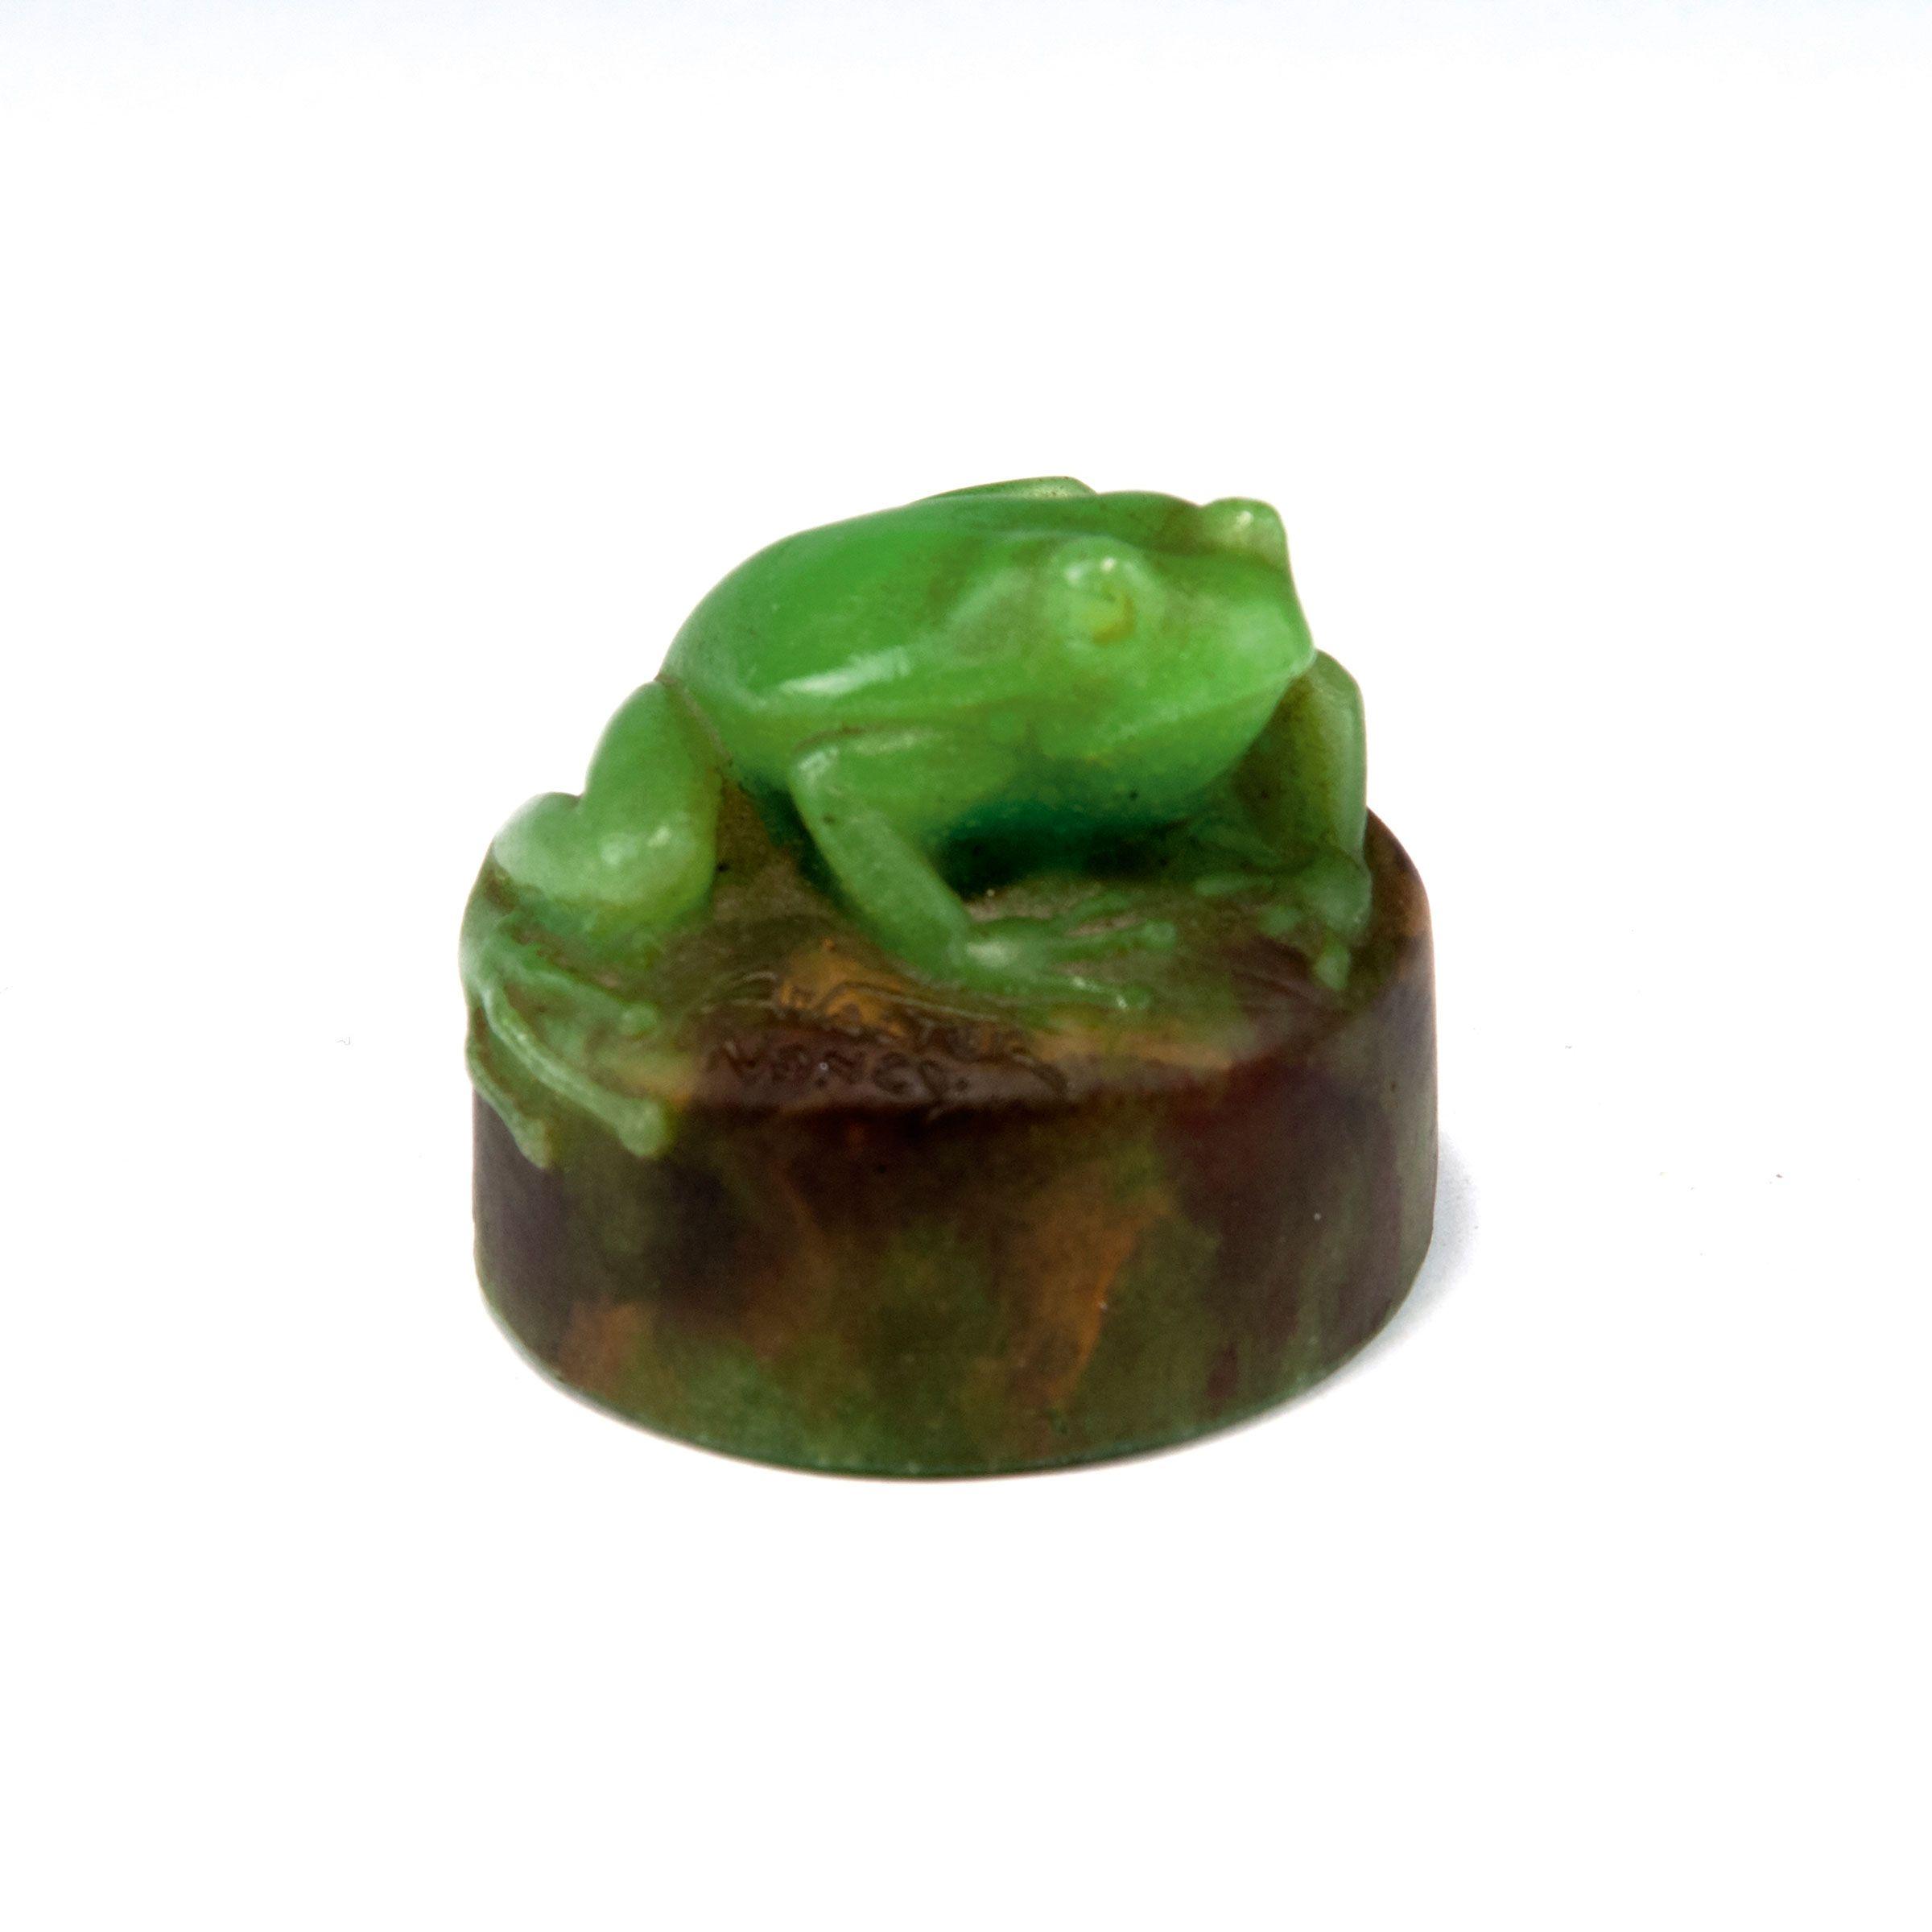 Frog, 1920-25